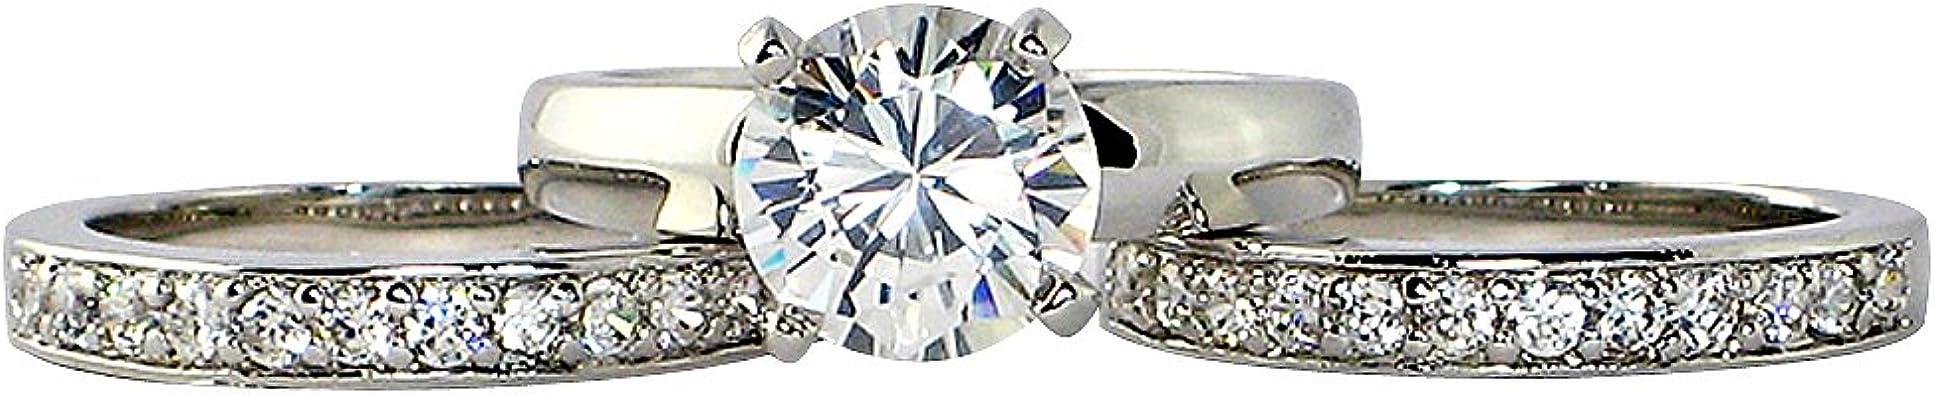 Bridal Ring Bling J51 product image 3